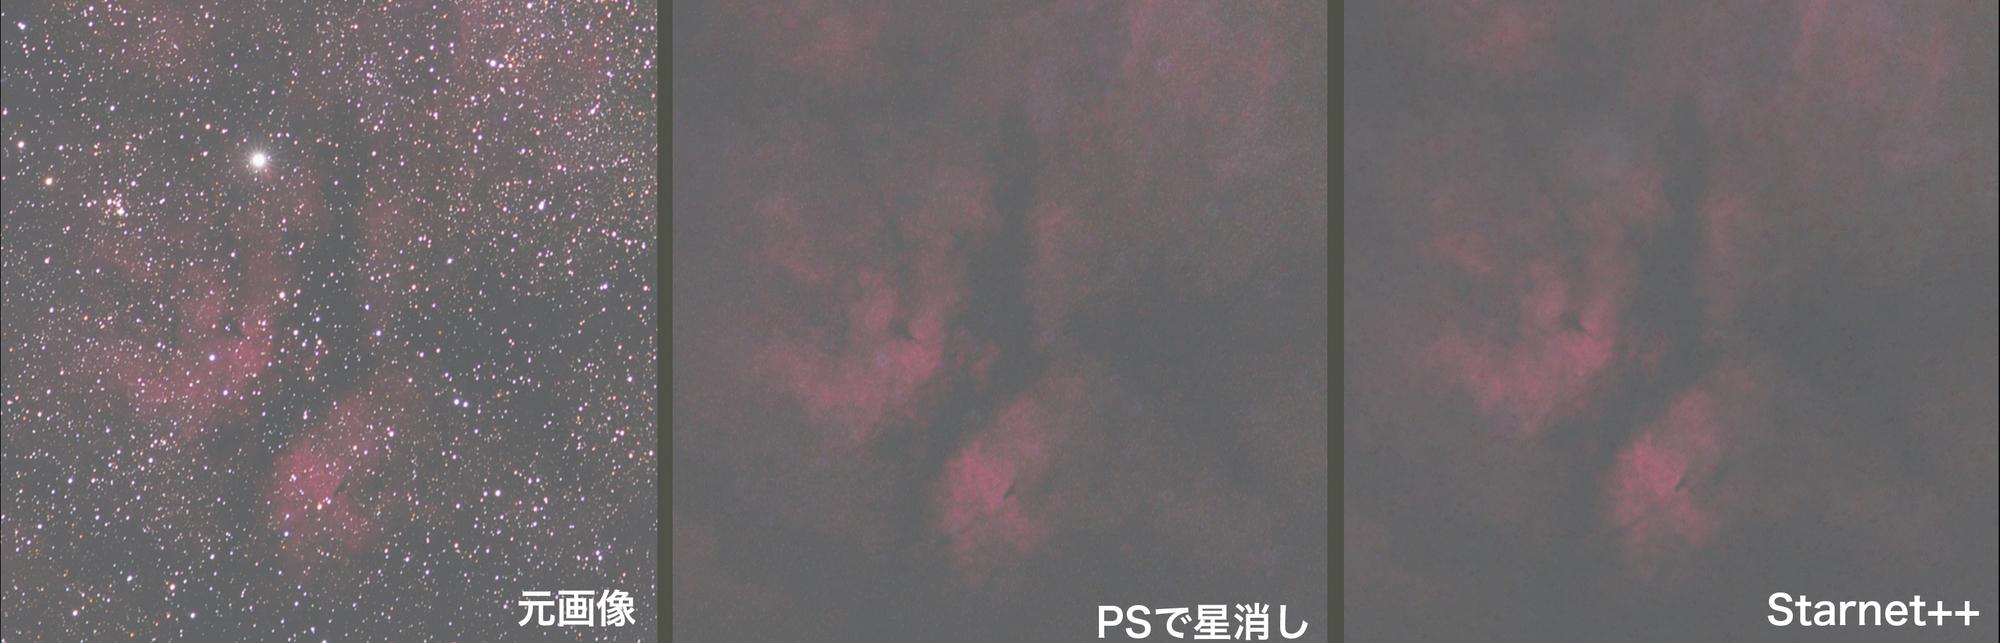 f:id:snct-astro:20190720022715j:plain